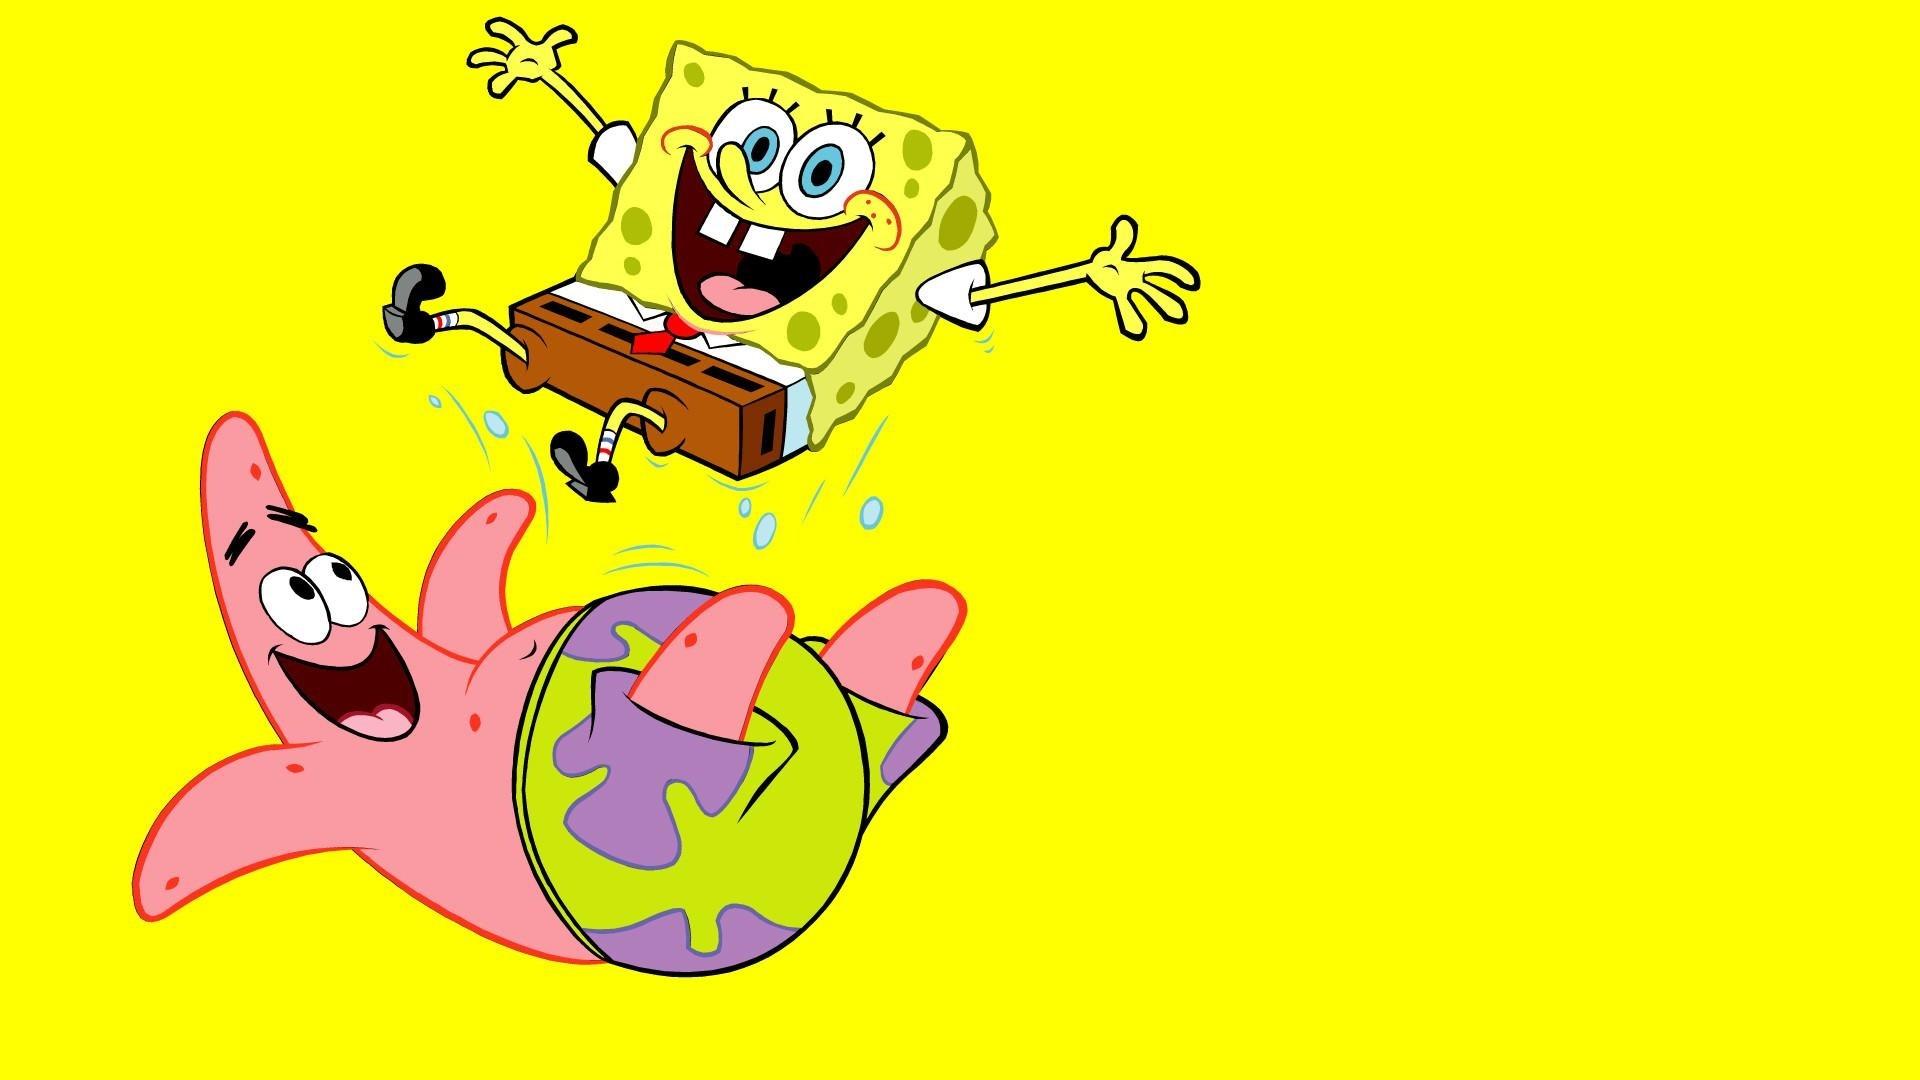 Aesthetic Spongebob wallpaper photo hd